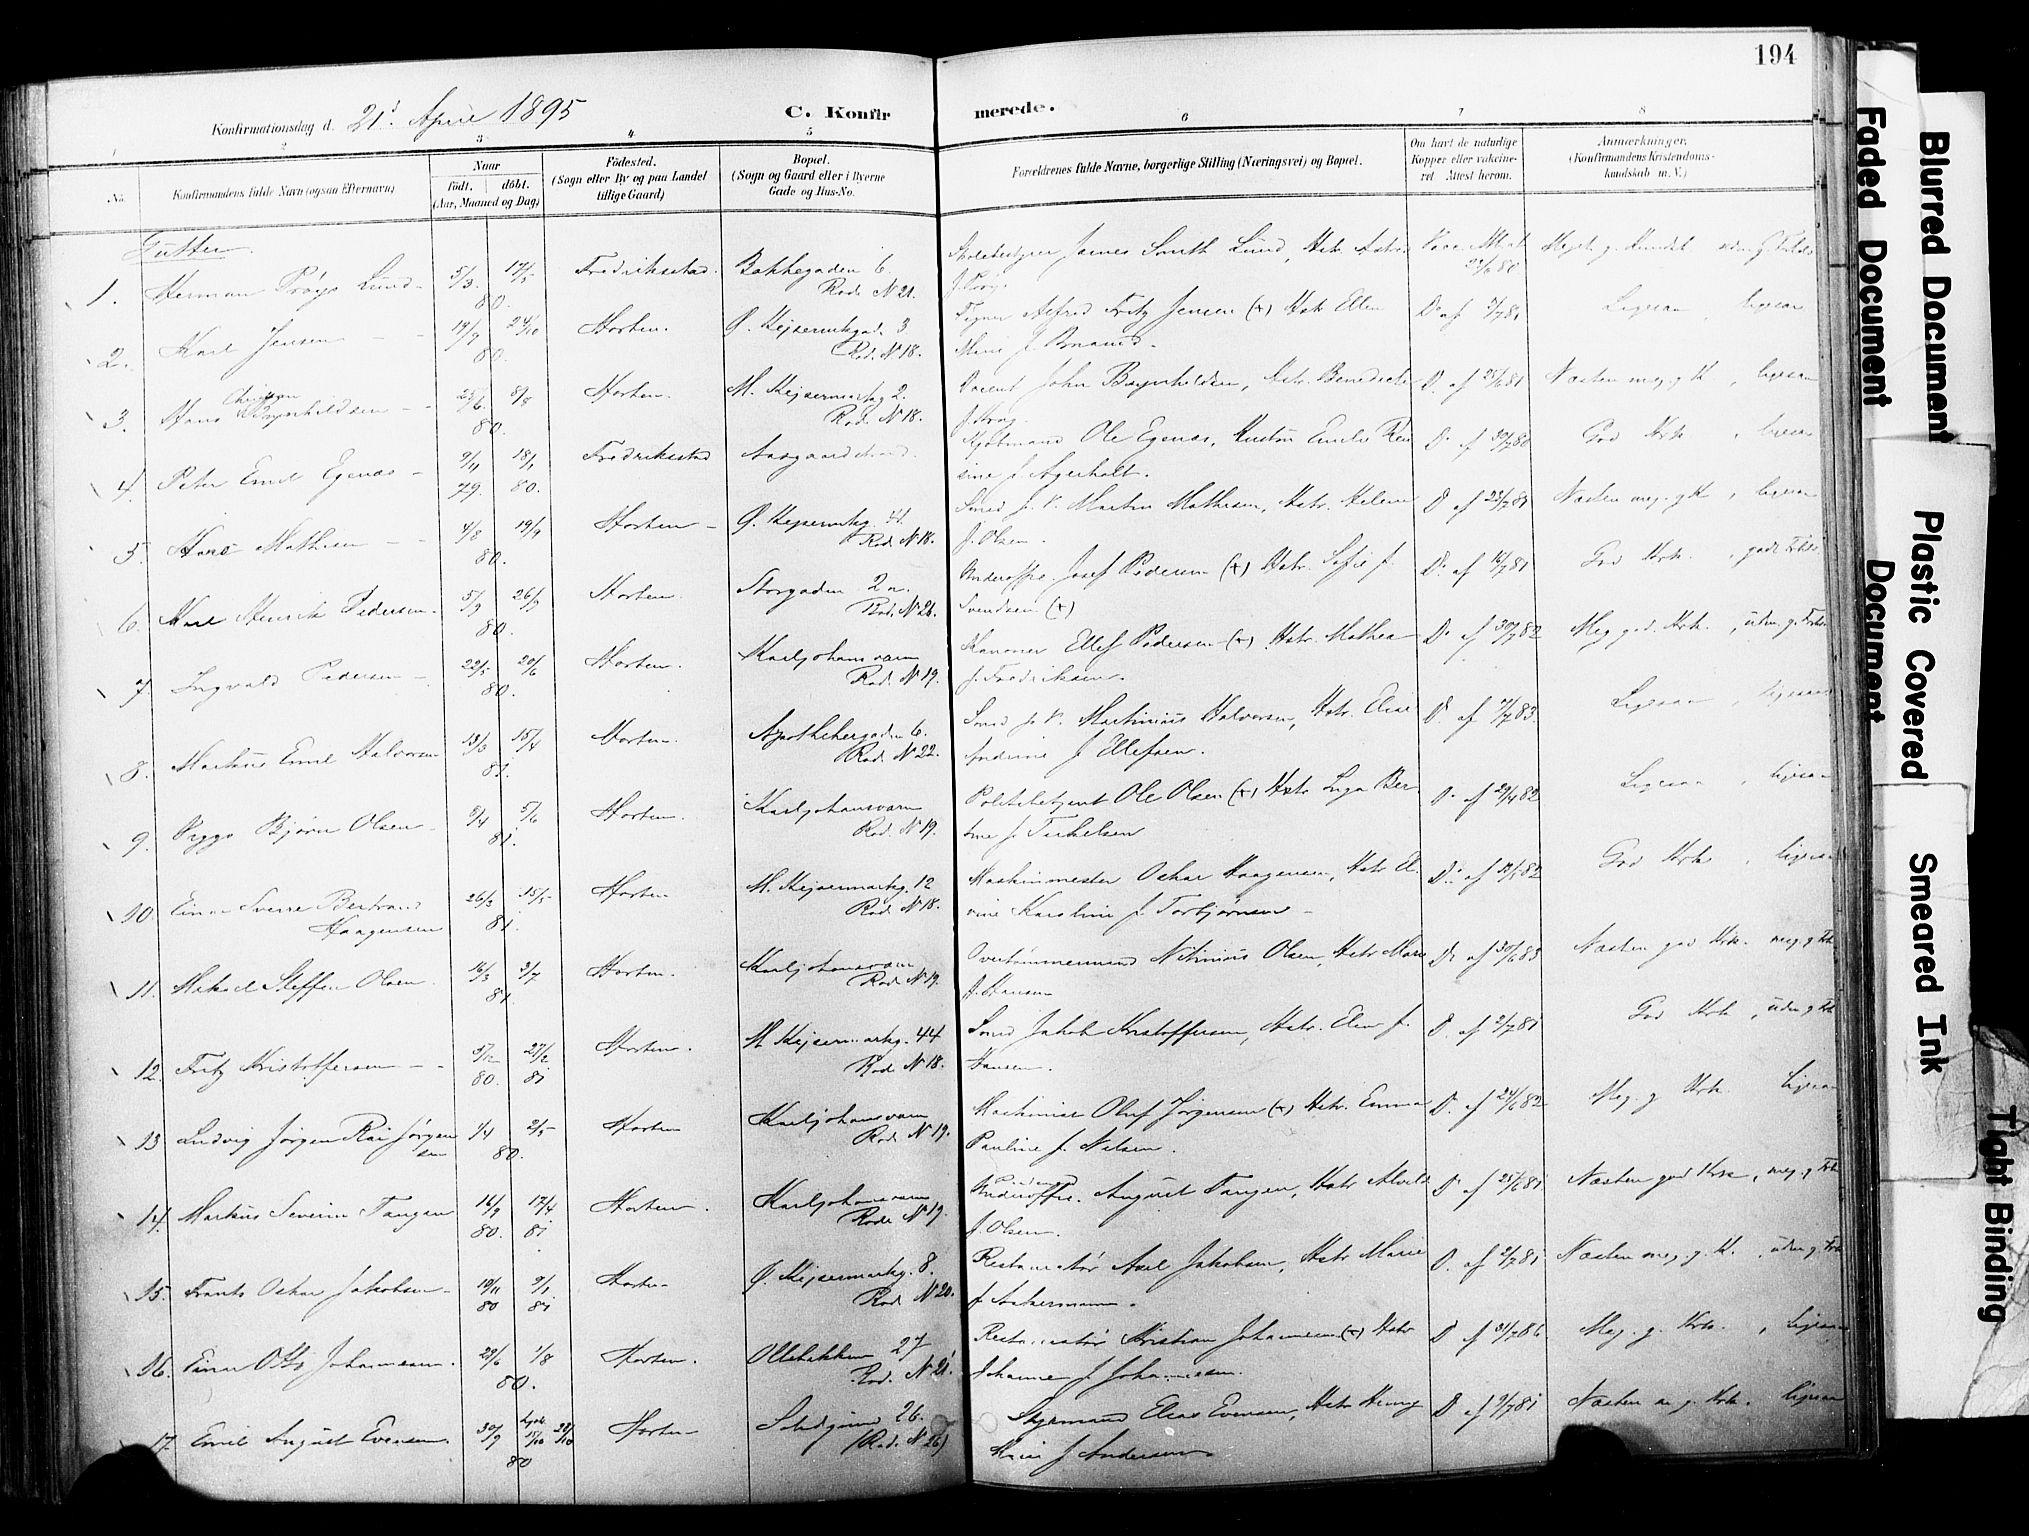 SAKO, Horten kirkebøker, F/Fa/L0004: Parish register (official) no. 4, 1888-1895, p. 194